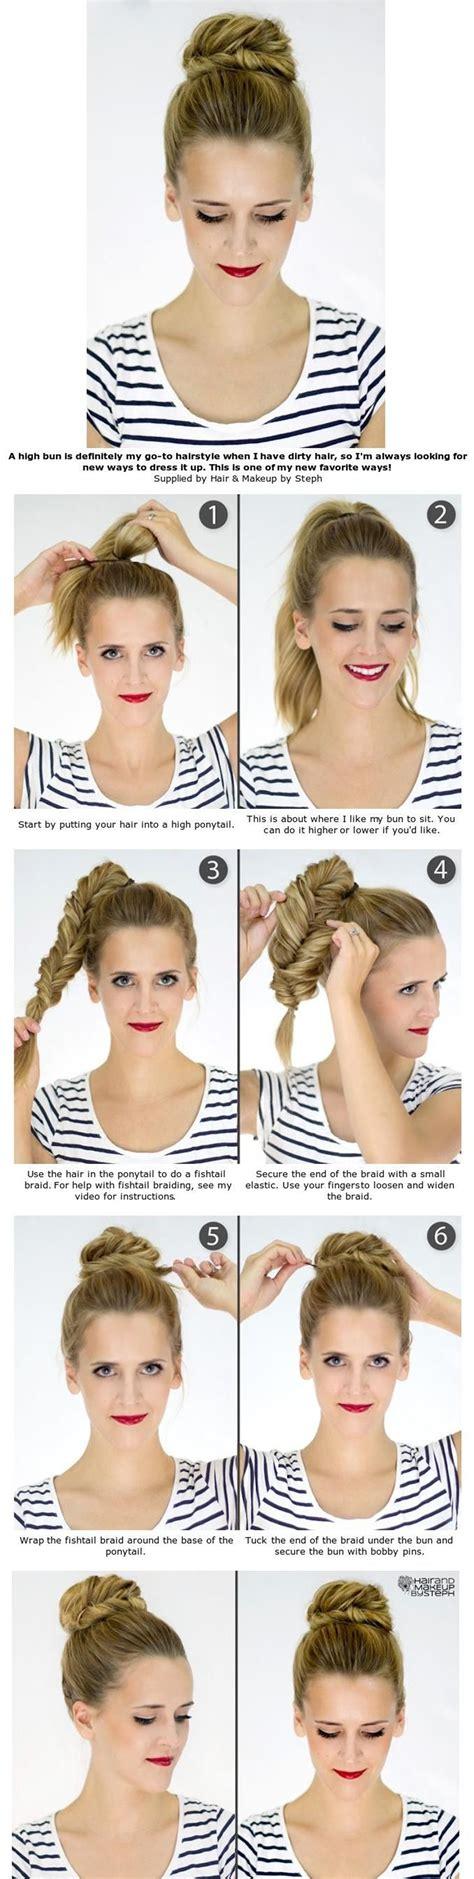 magnolia strebe 5 year old creates hair tutorials for